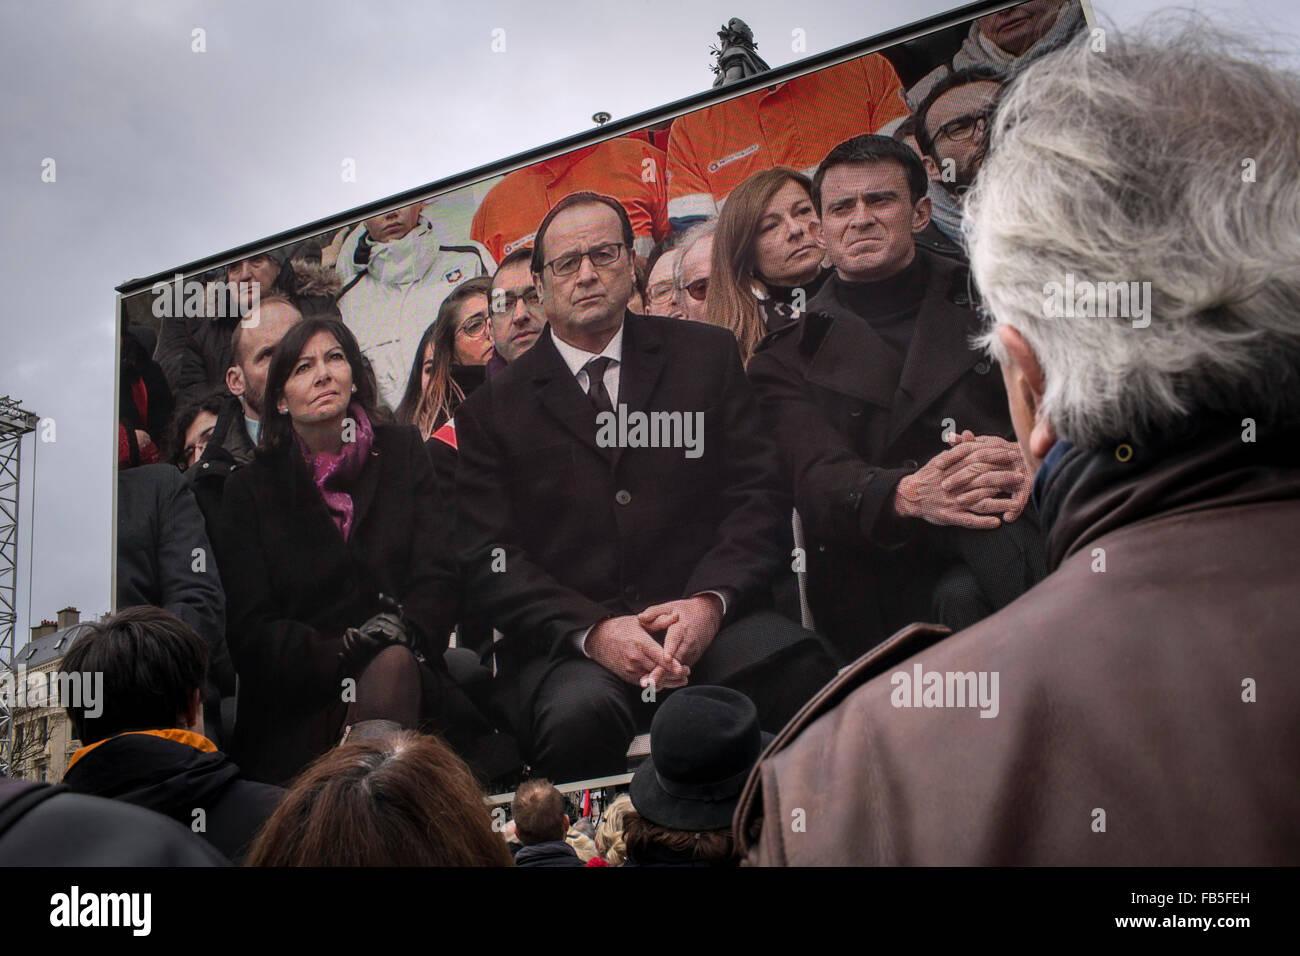 Paris, France. 10th Jan, 2016. A screen shows (L-R) Paris Mayor Anne Hidalgo, French President Francois Hollande, Stock Photo